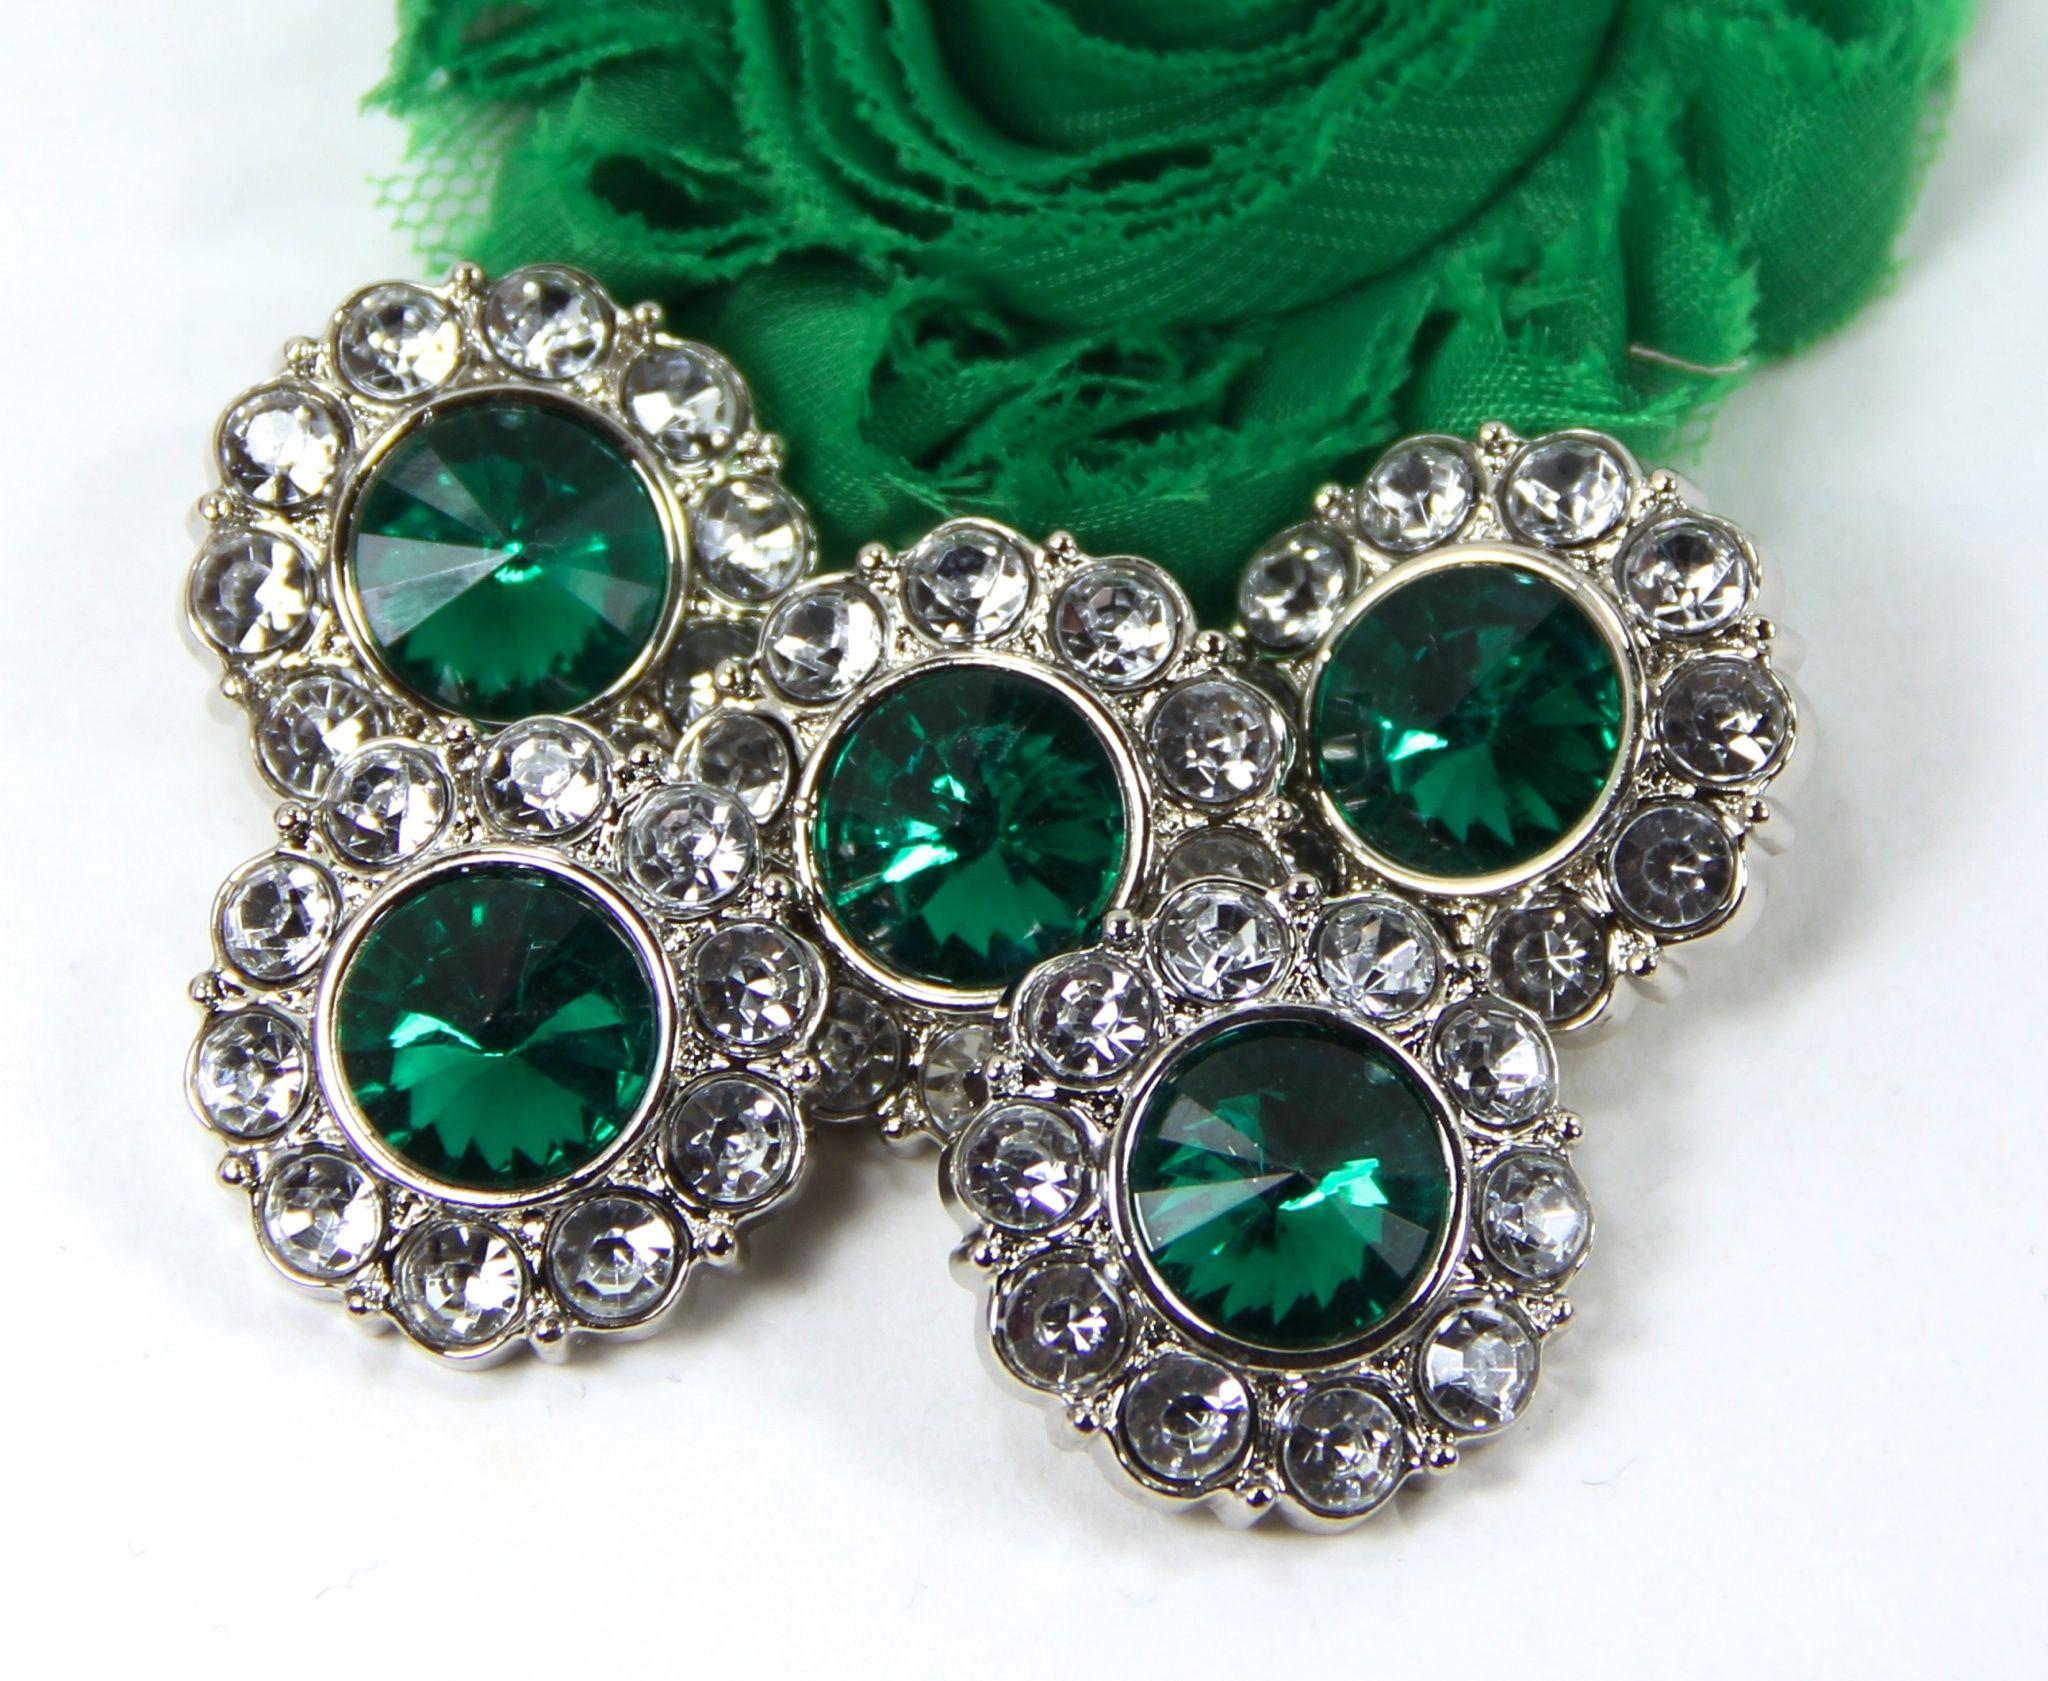 5 pcs 21mm clear w// emerald green center acrylic rhinestone button